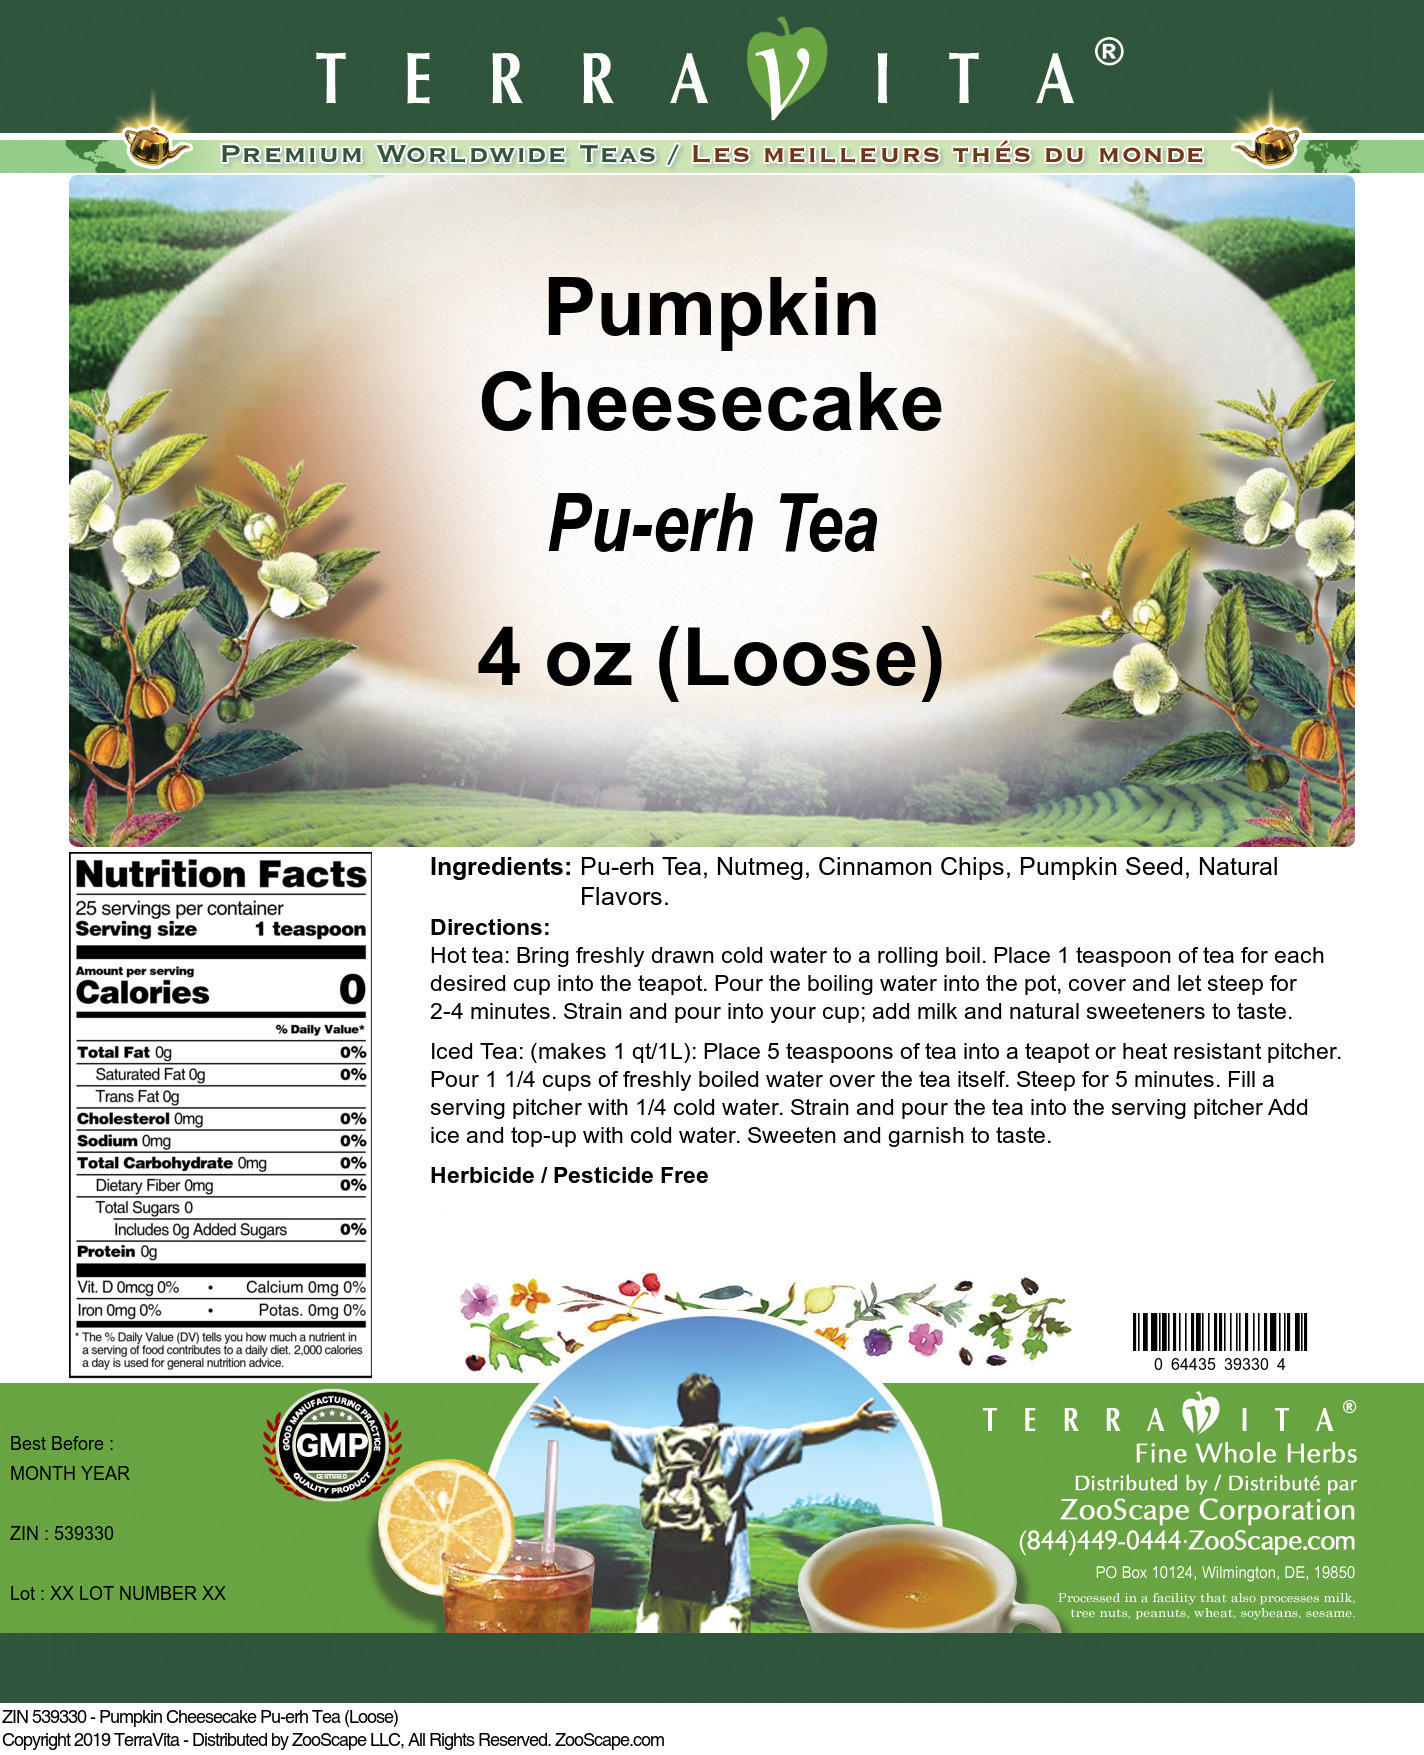 Pumpkin Cheesecake Pu-erh Tea (Loose)